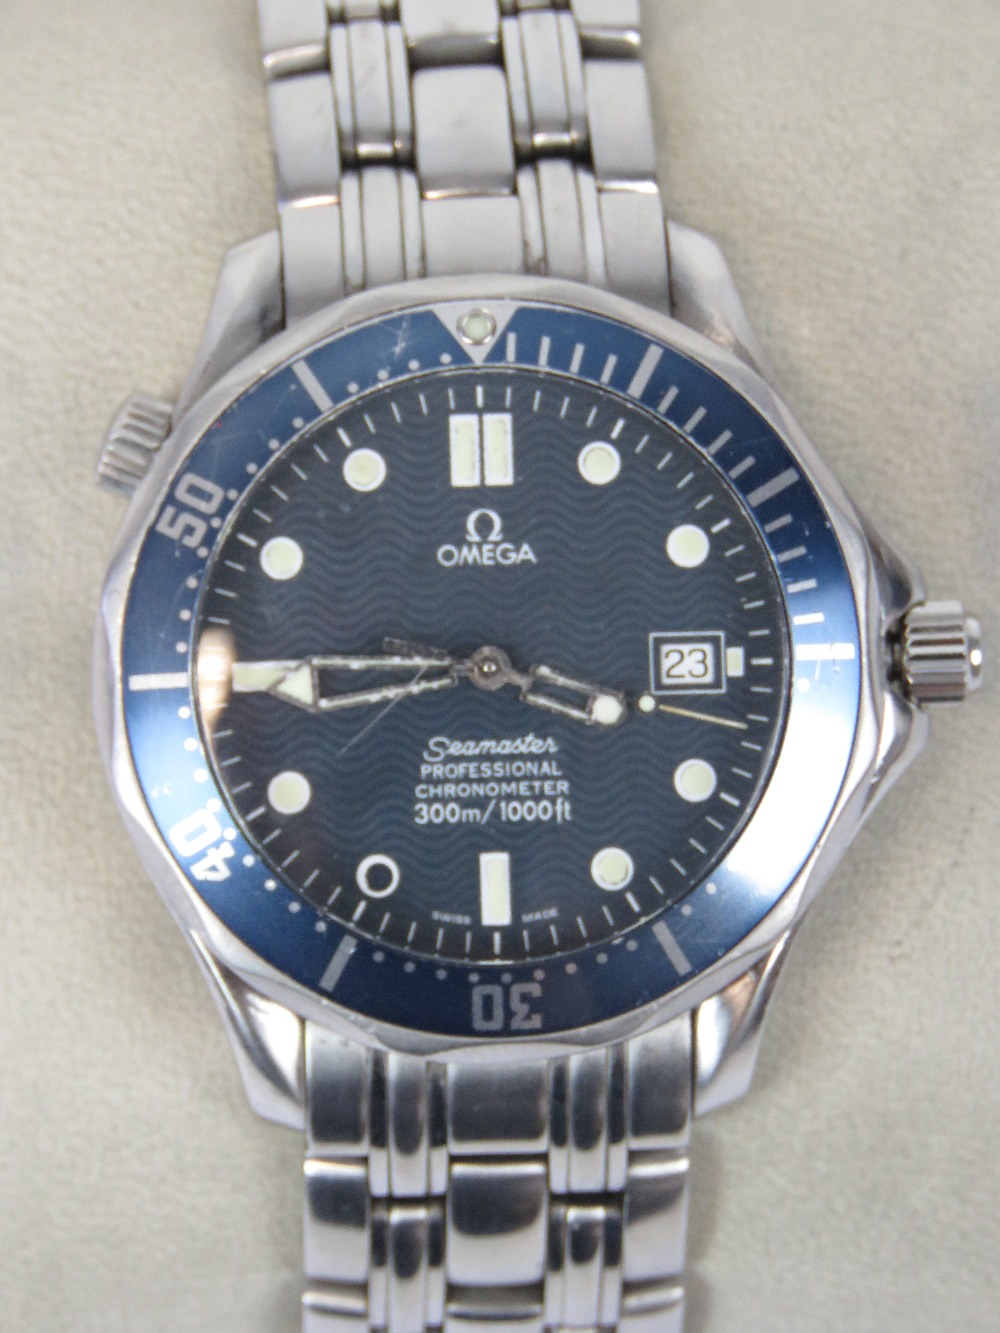 Lot 367 - An Omega Seamaster Chronometer stainless